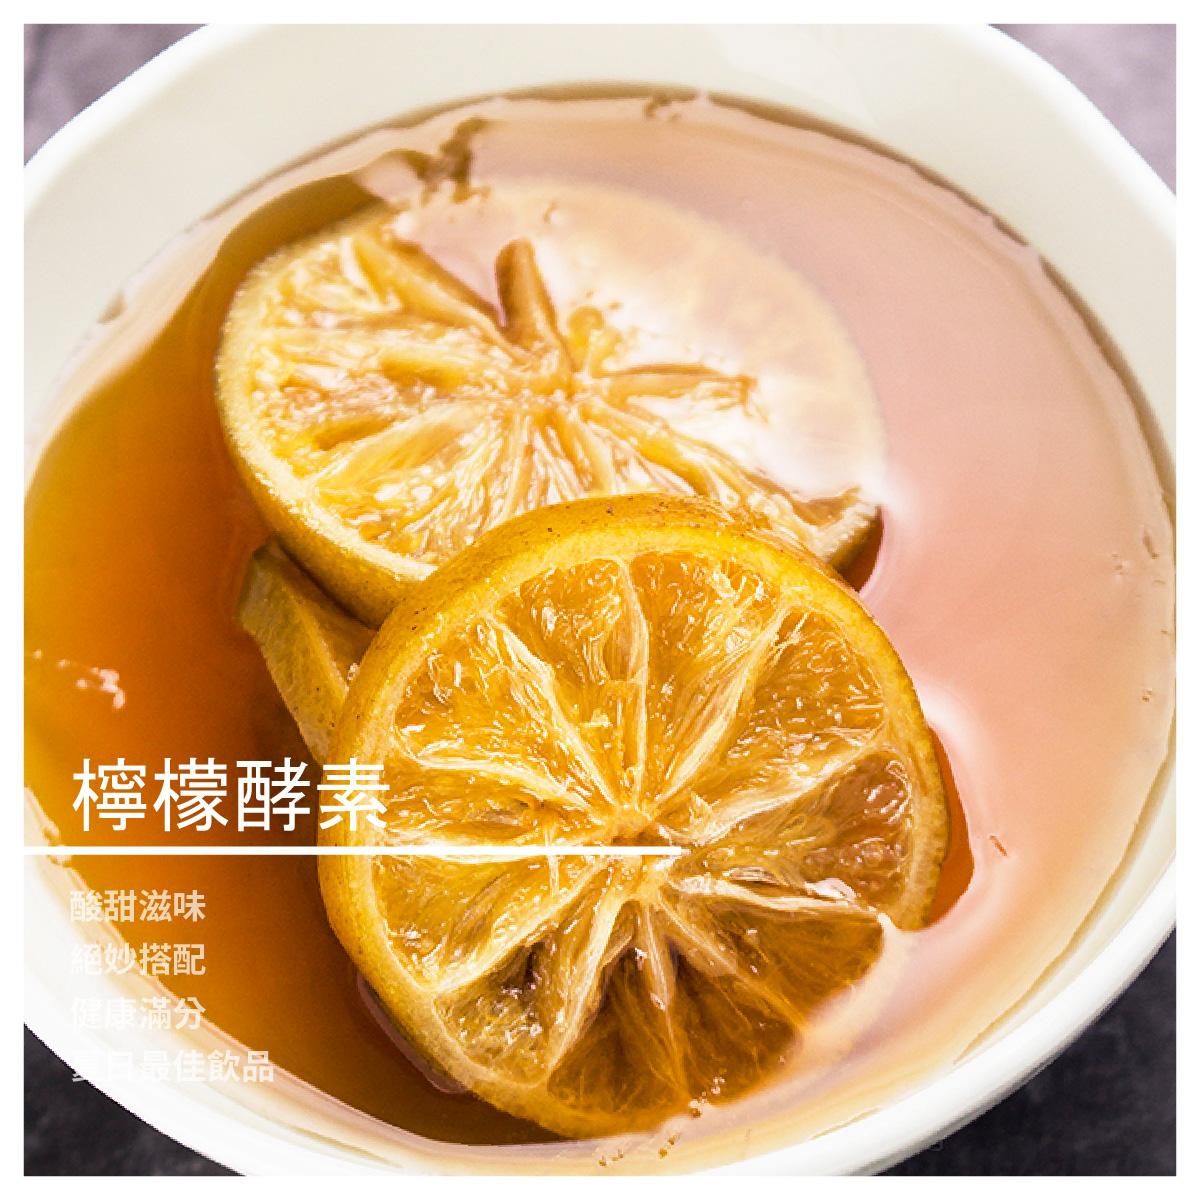 【糖的魔術師】檸檬酵素/罐